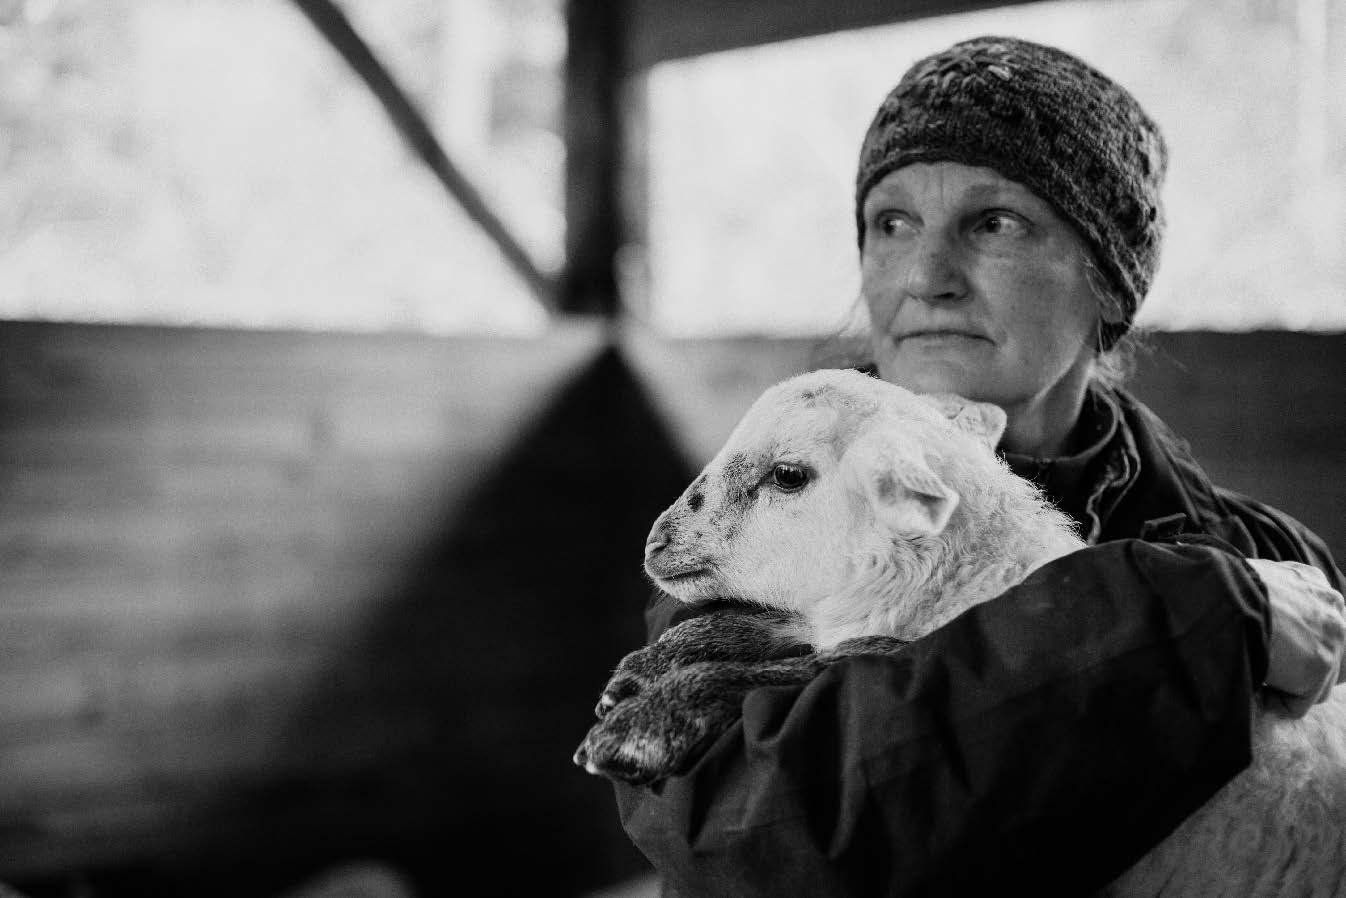 Lynn Swanson von der Glendale Shepherd Farm in Clinton, Washington © Audra Mulkern